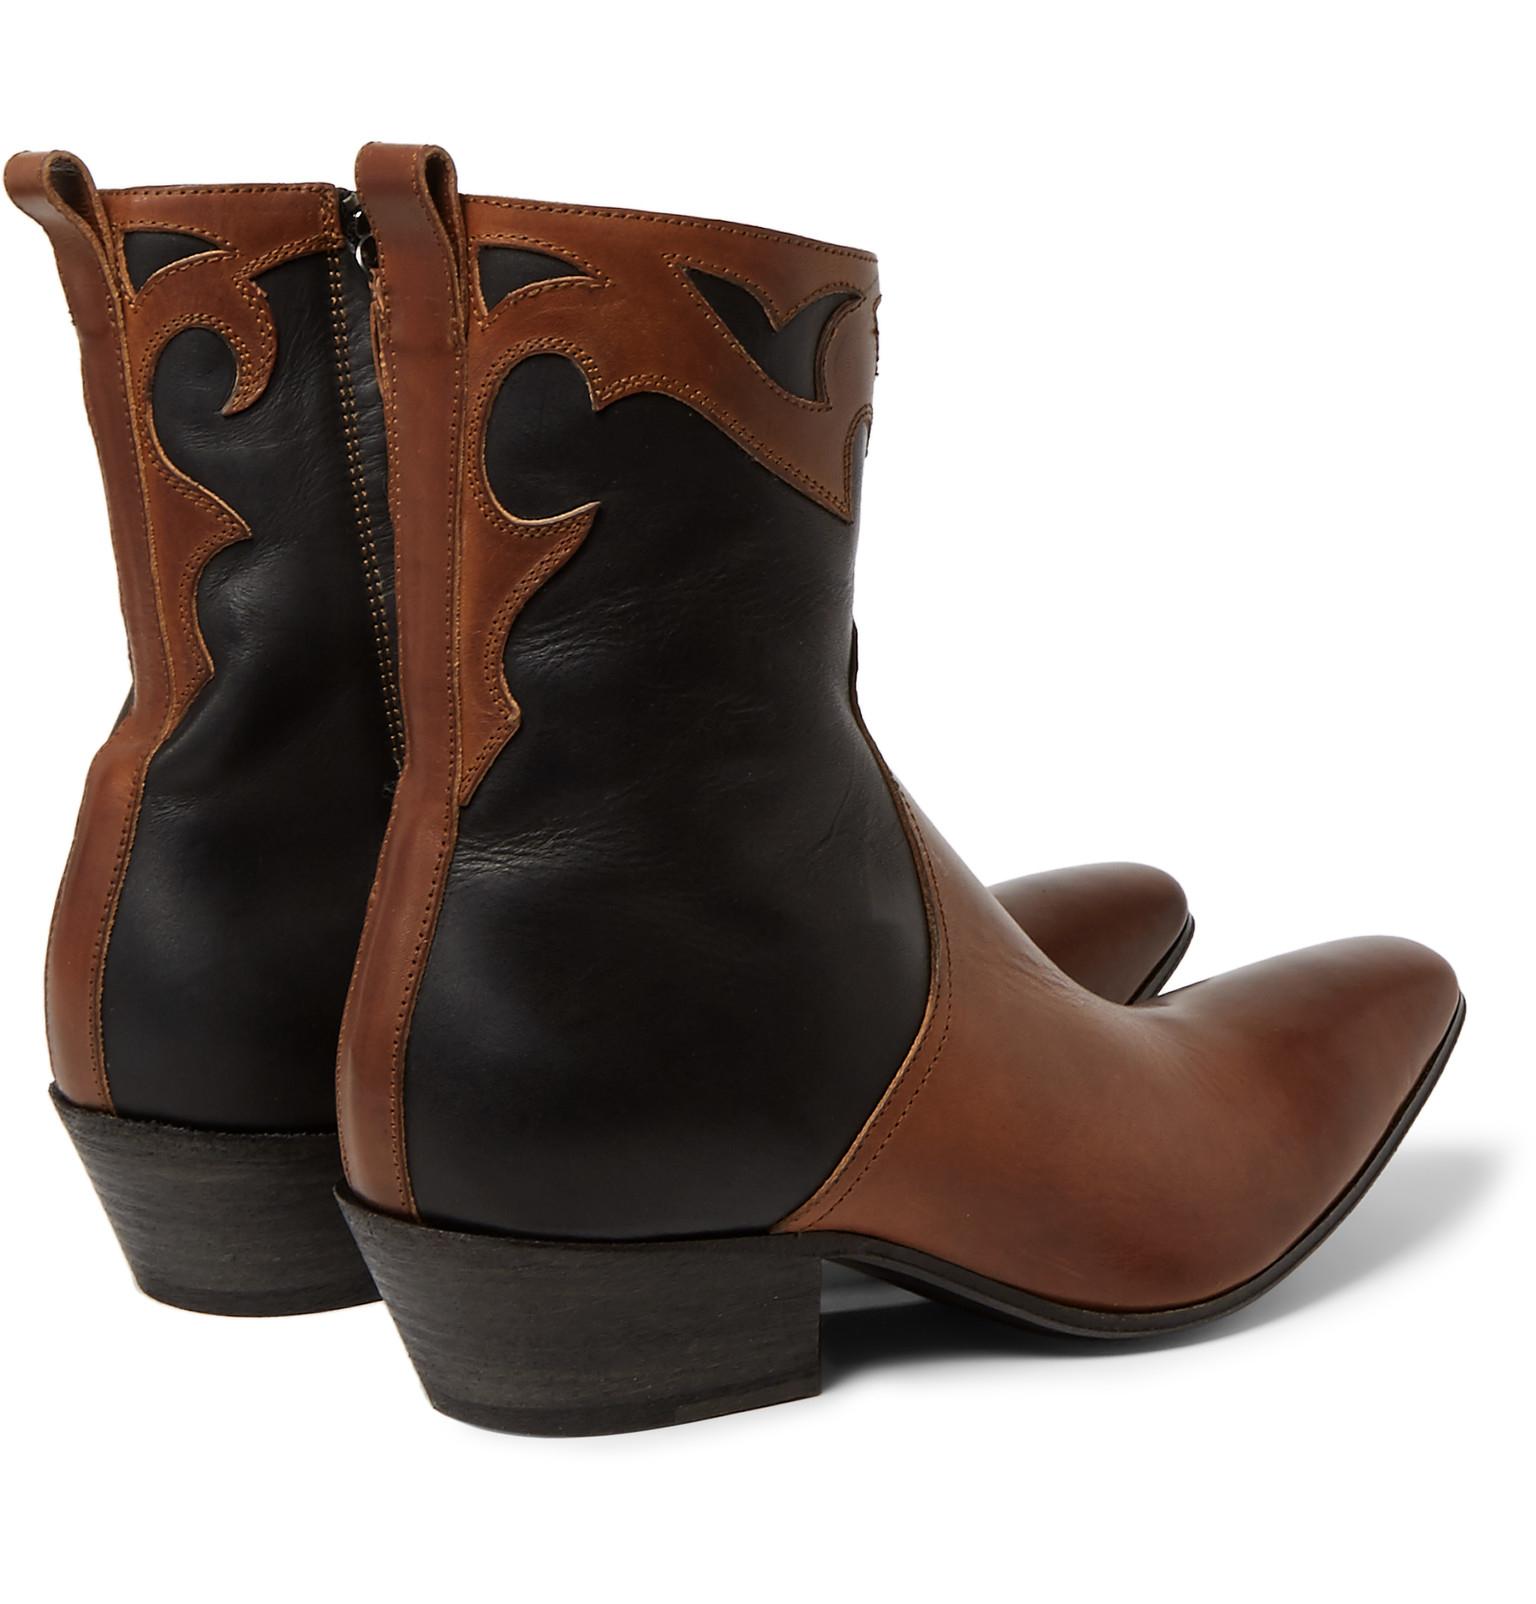 Haider Ackermann Black Suede Virgil Boots lV7rBZD